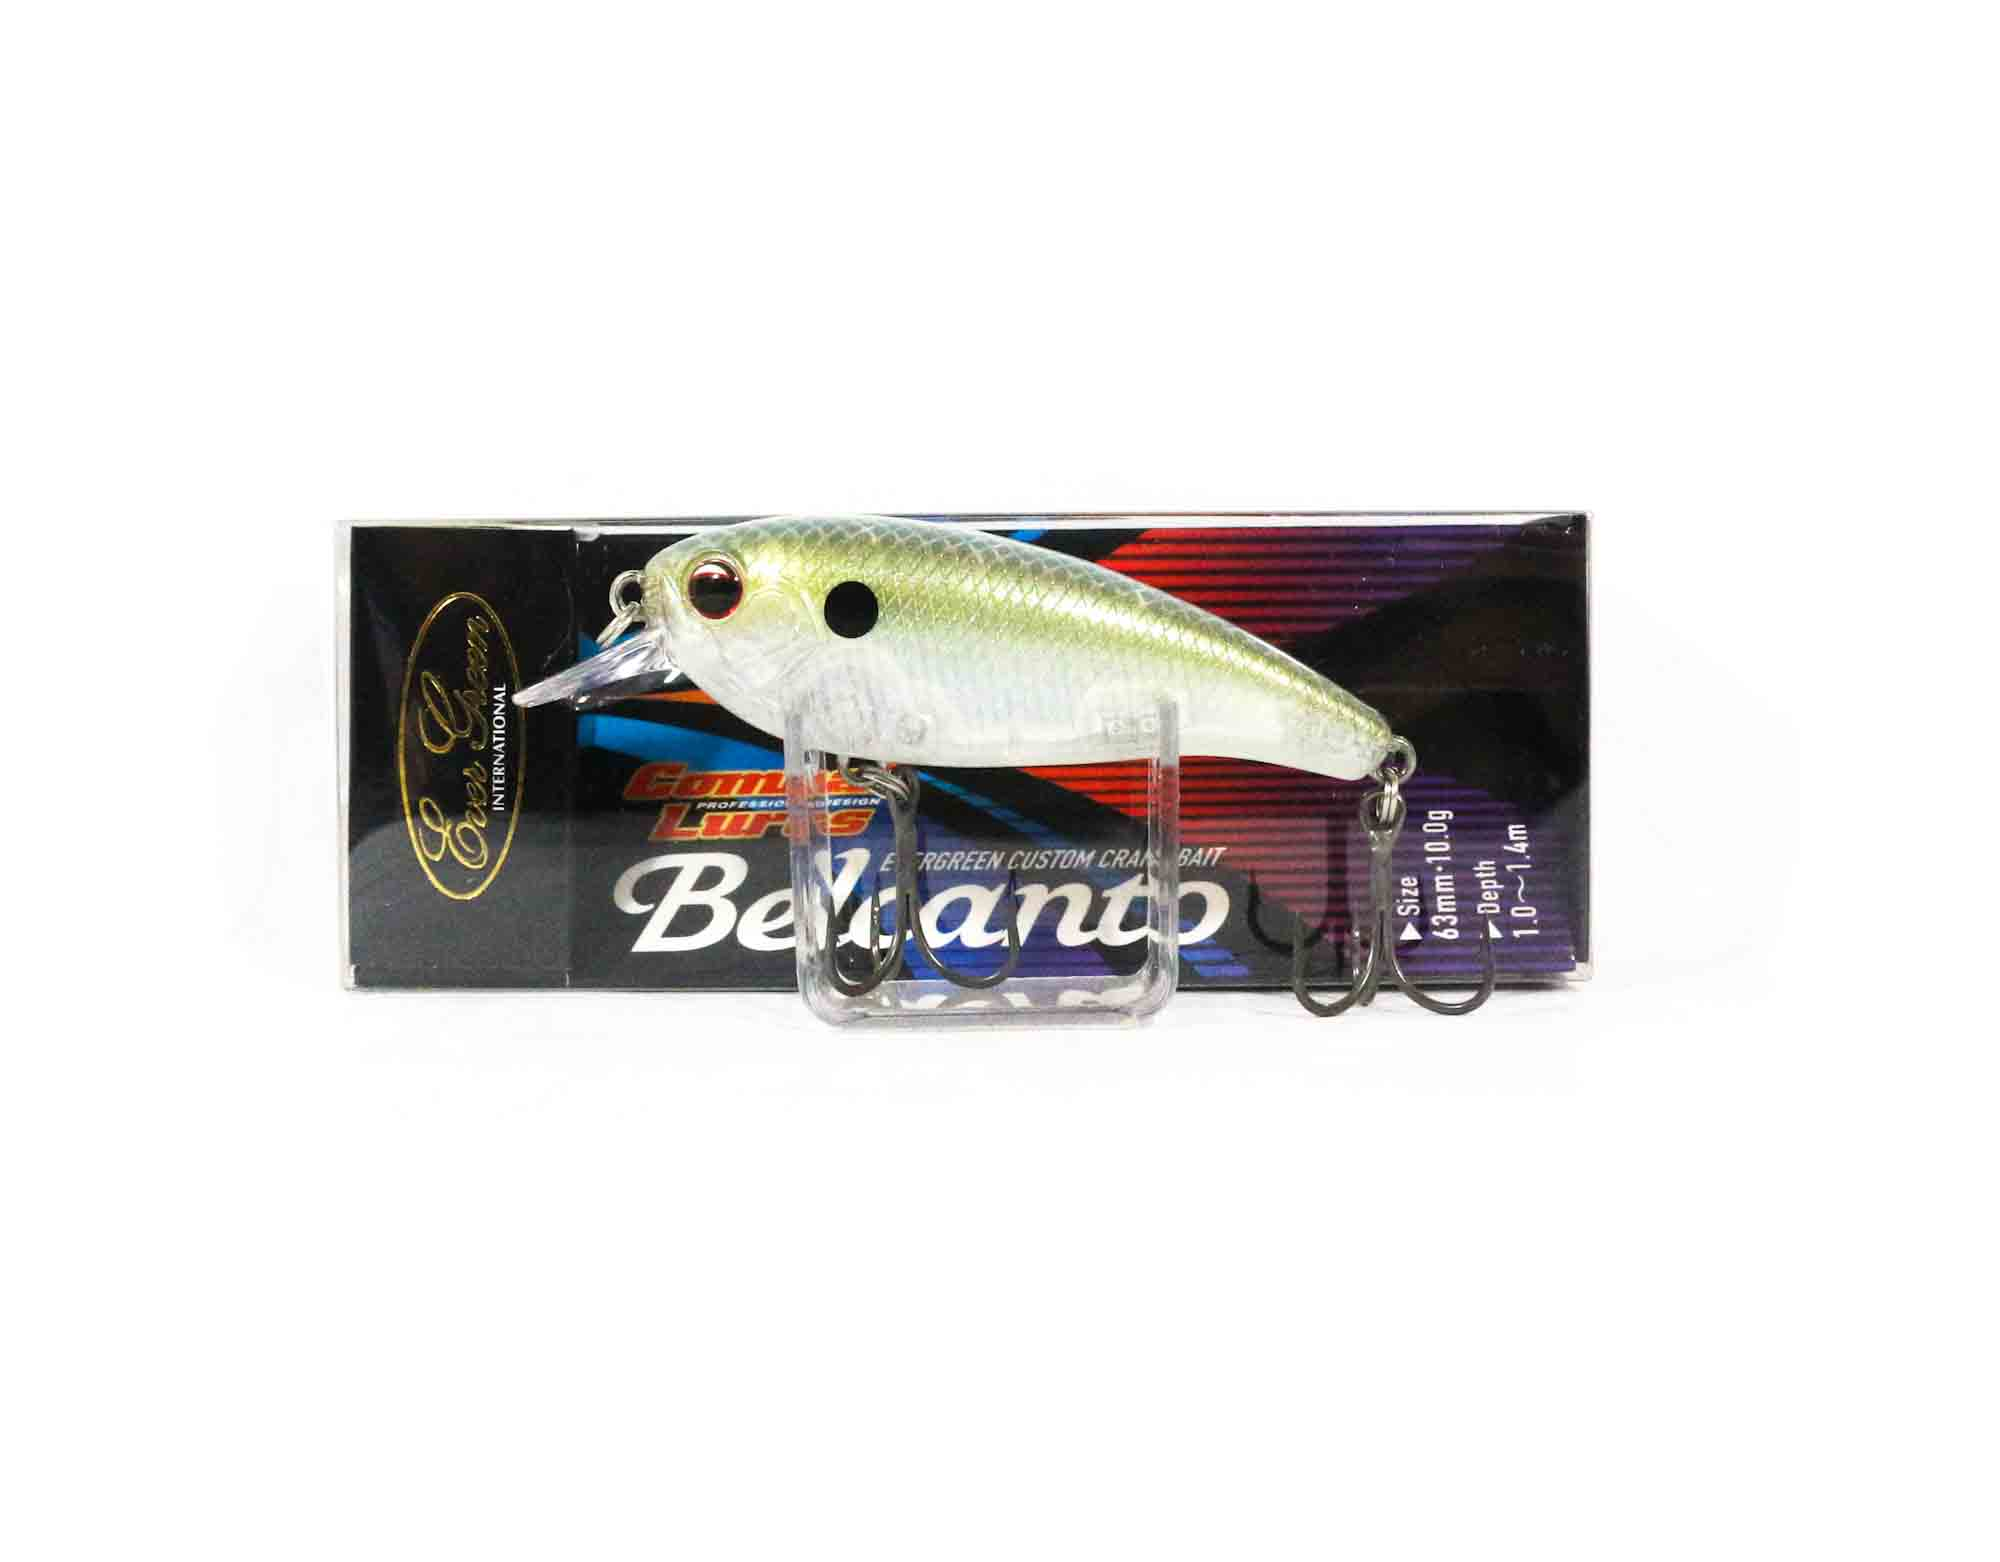 Evergreen Belcanto 63 Floating Lure 390 (3831)